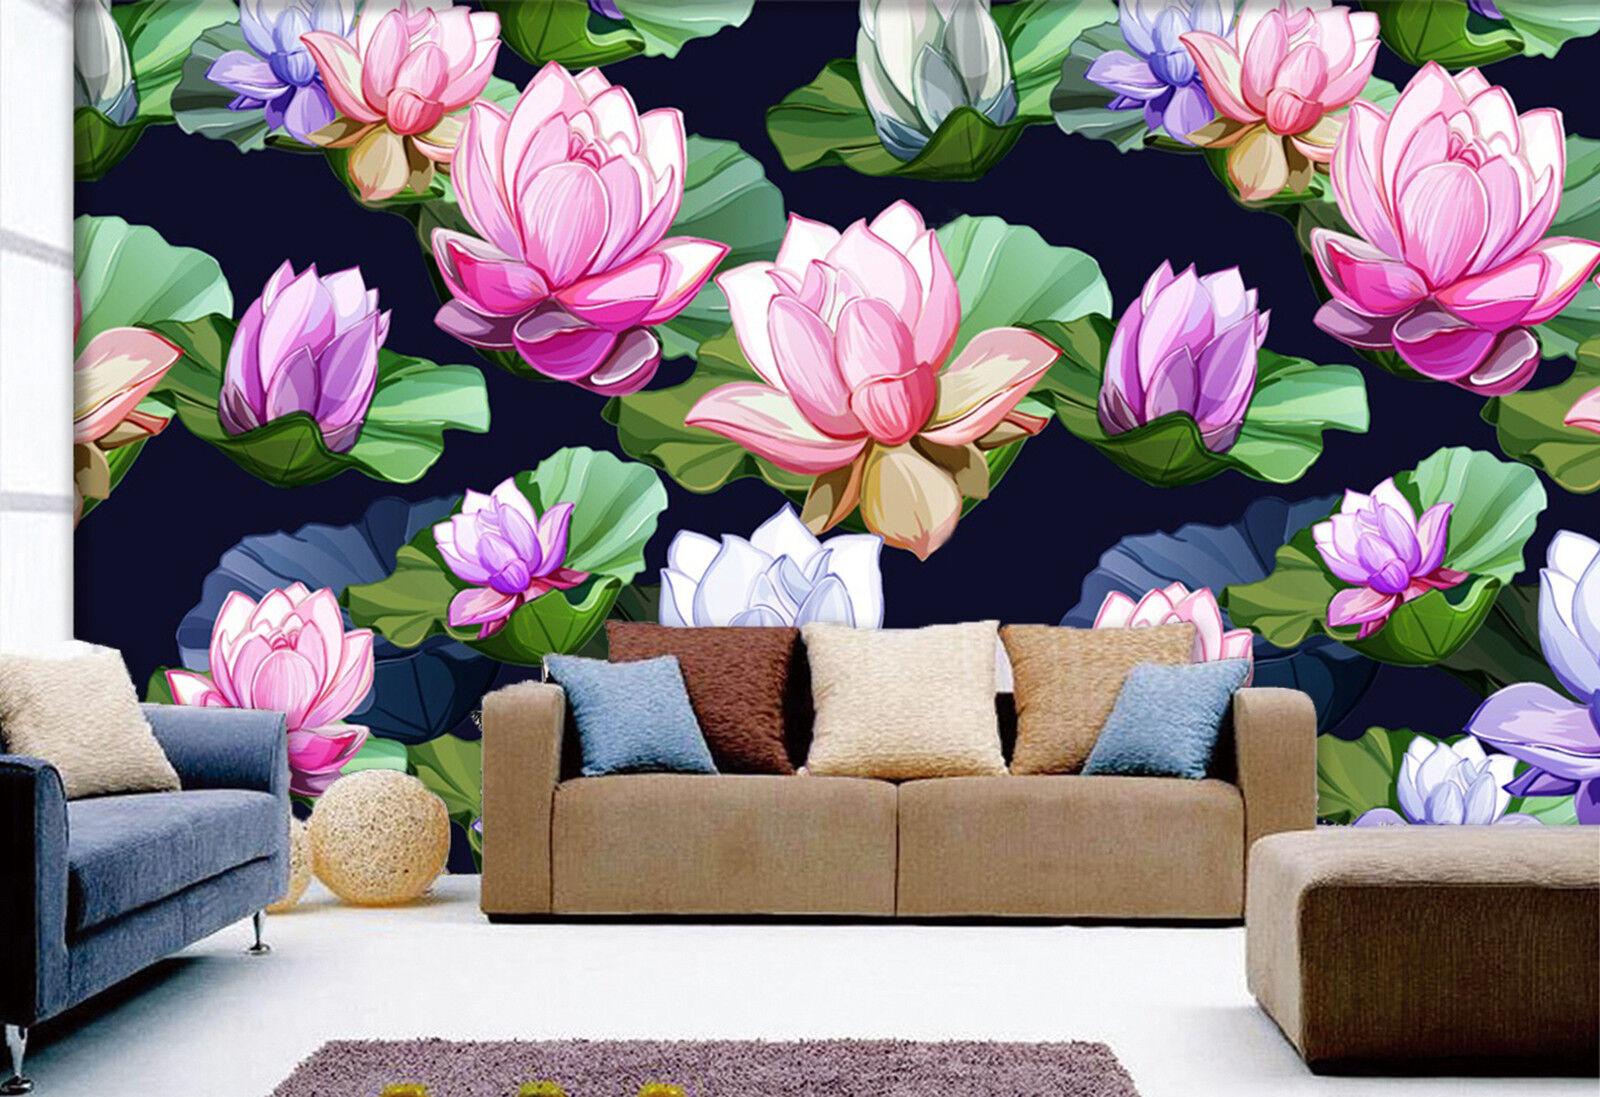 3D Lotus-Teich Fototapeten Wandbild Fototapete Bild Tapete Familie Kinder